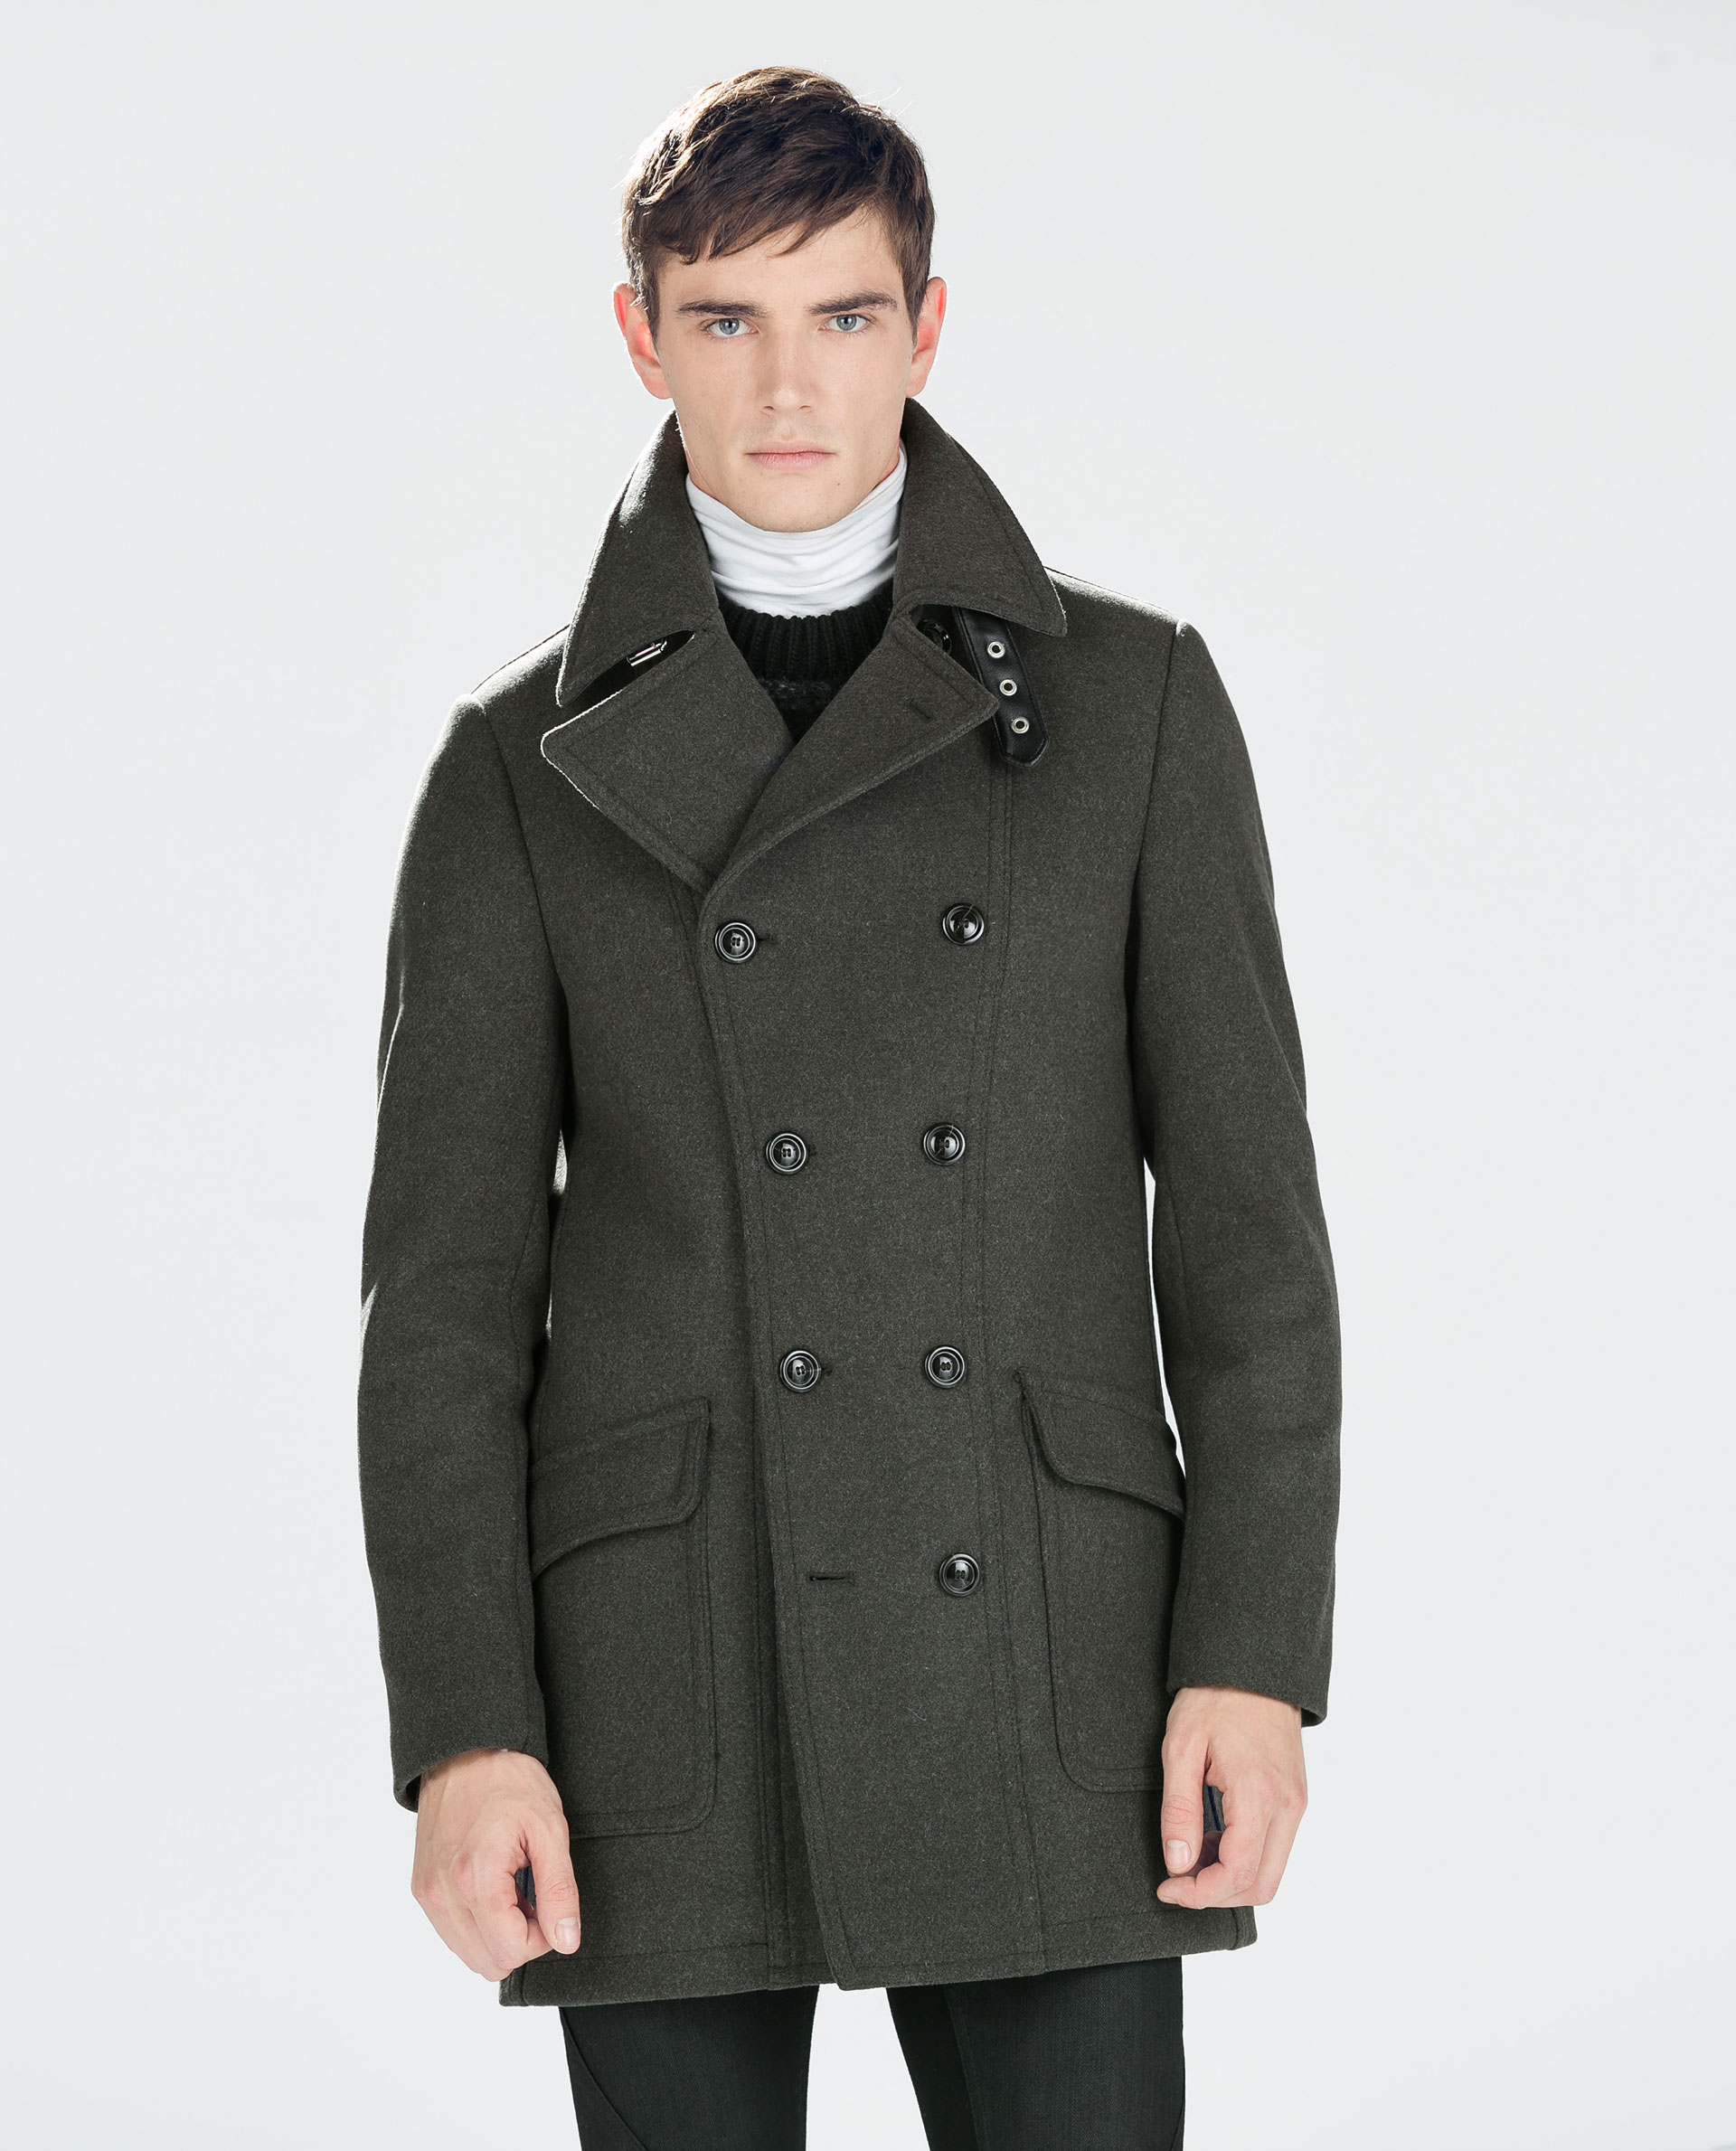 Zara Double Breasted Coat in Green for Men | Lyst